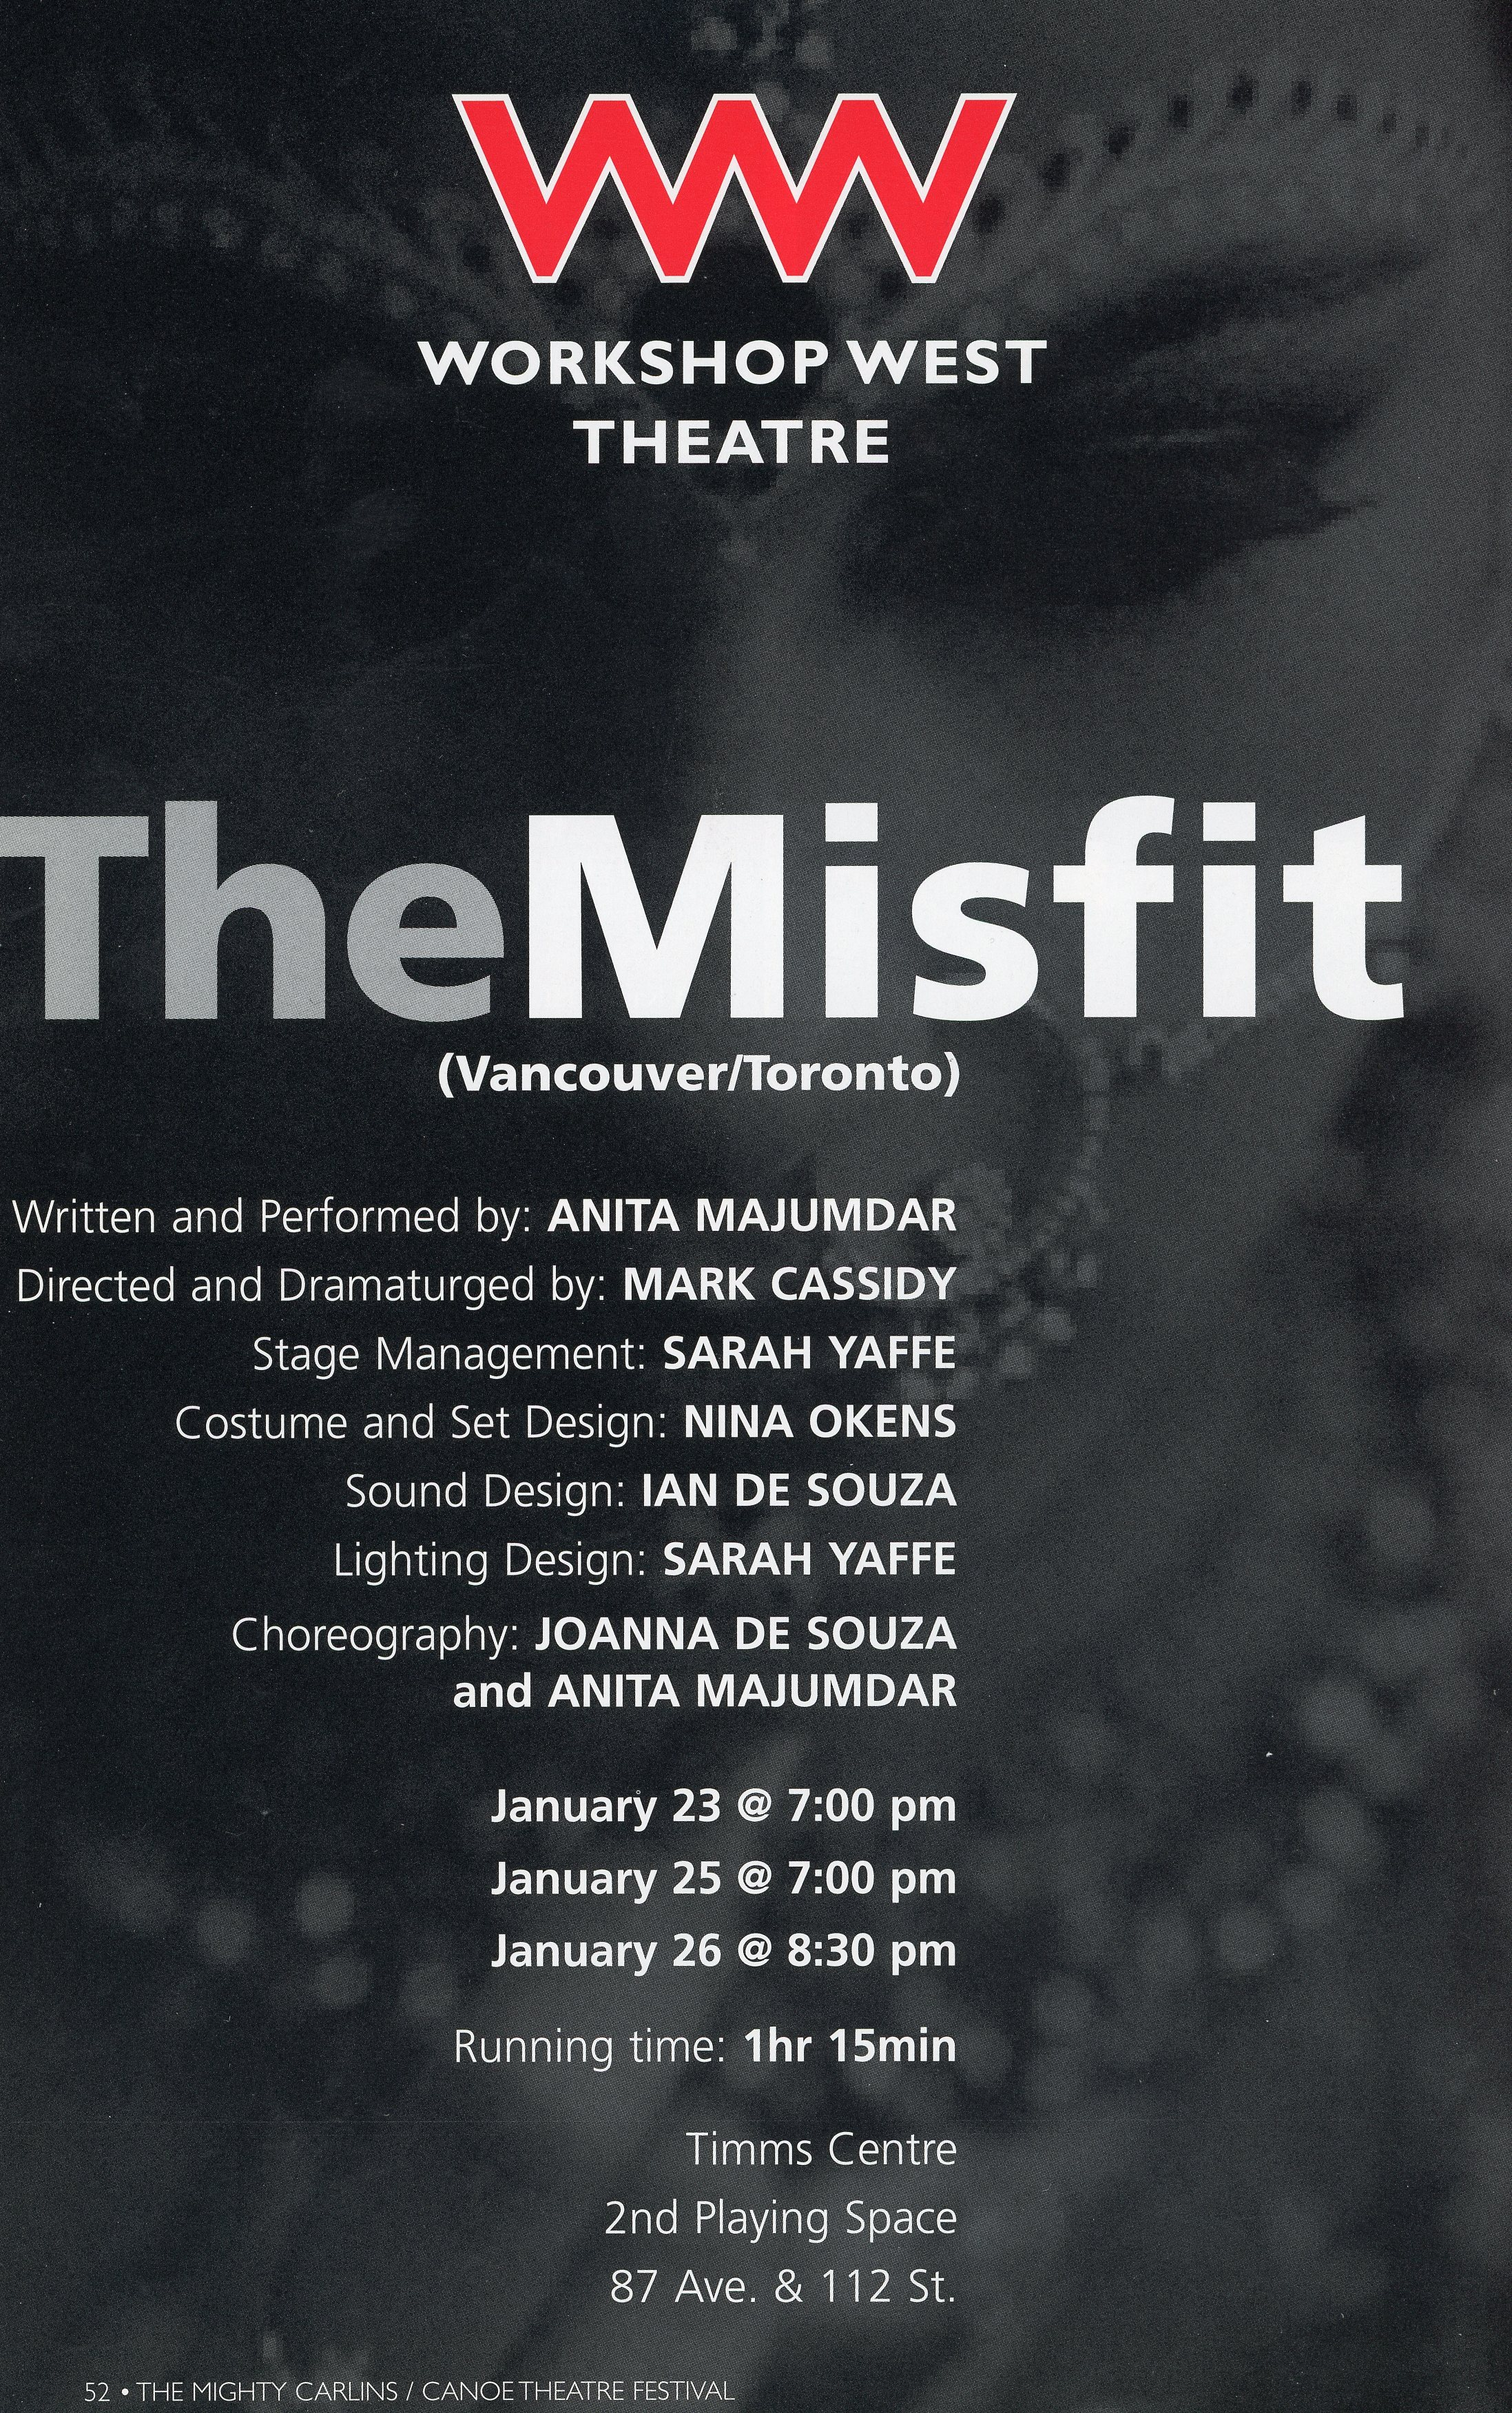 Workshop West Theatre (2008)-Production Information- The Misfit_JPEG.jpg